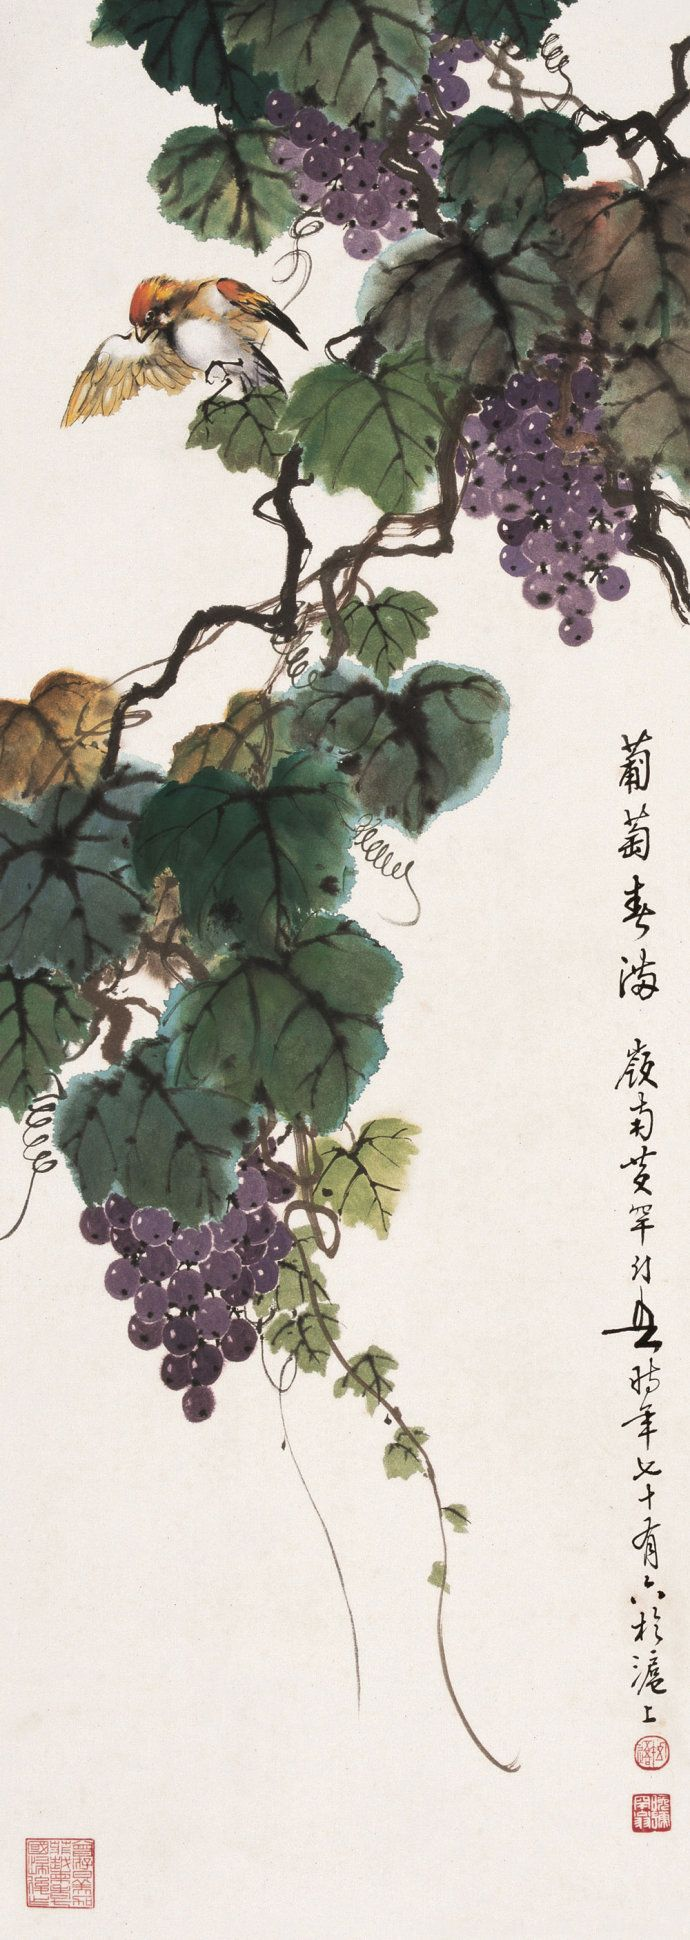 #MasterHuangHuanWu #ChinesePaintingGrapes #AsianBrushPainting